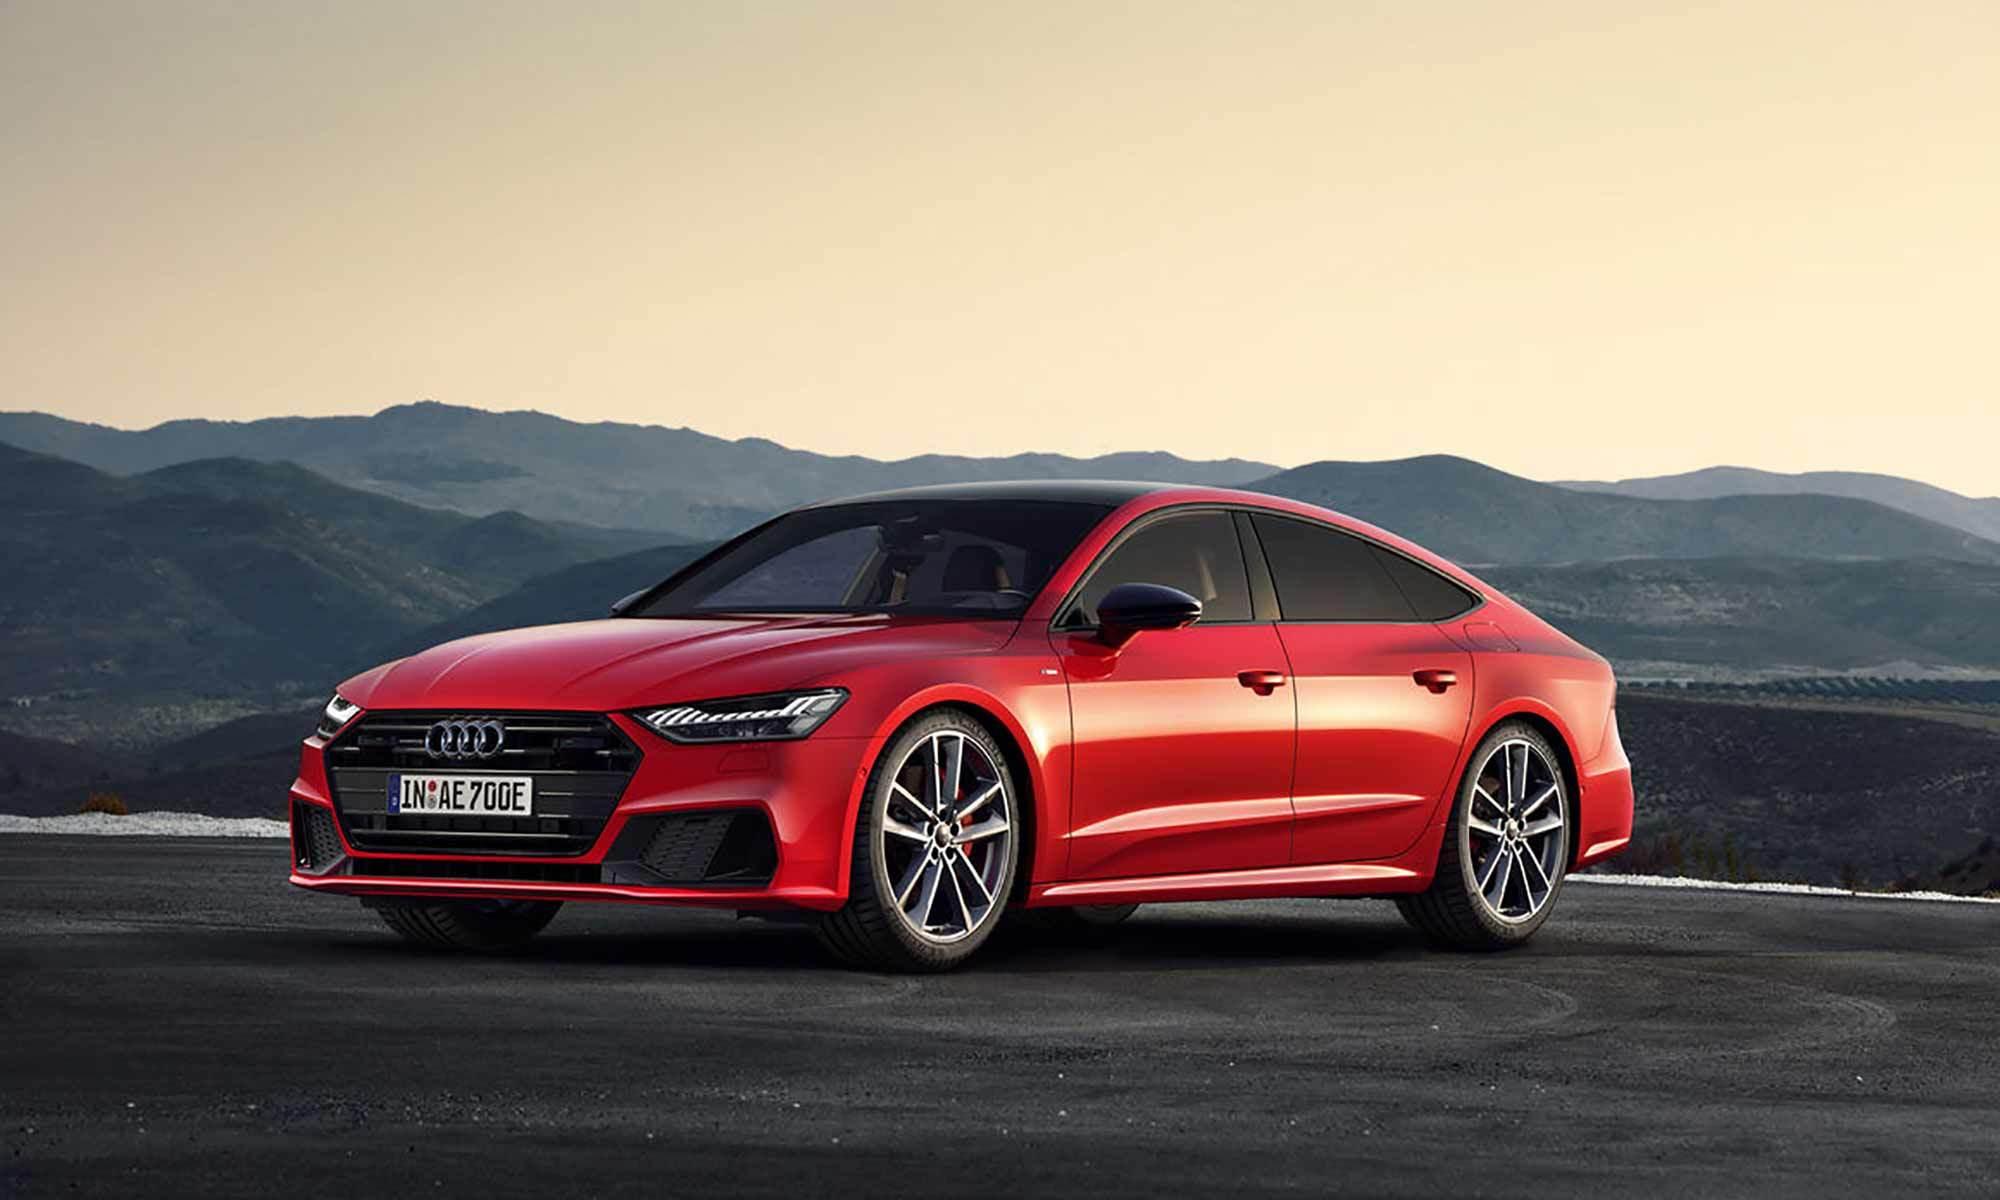 Audi A7 Tfsie Lifestyle